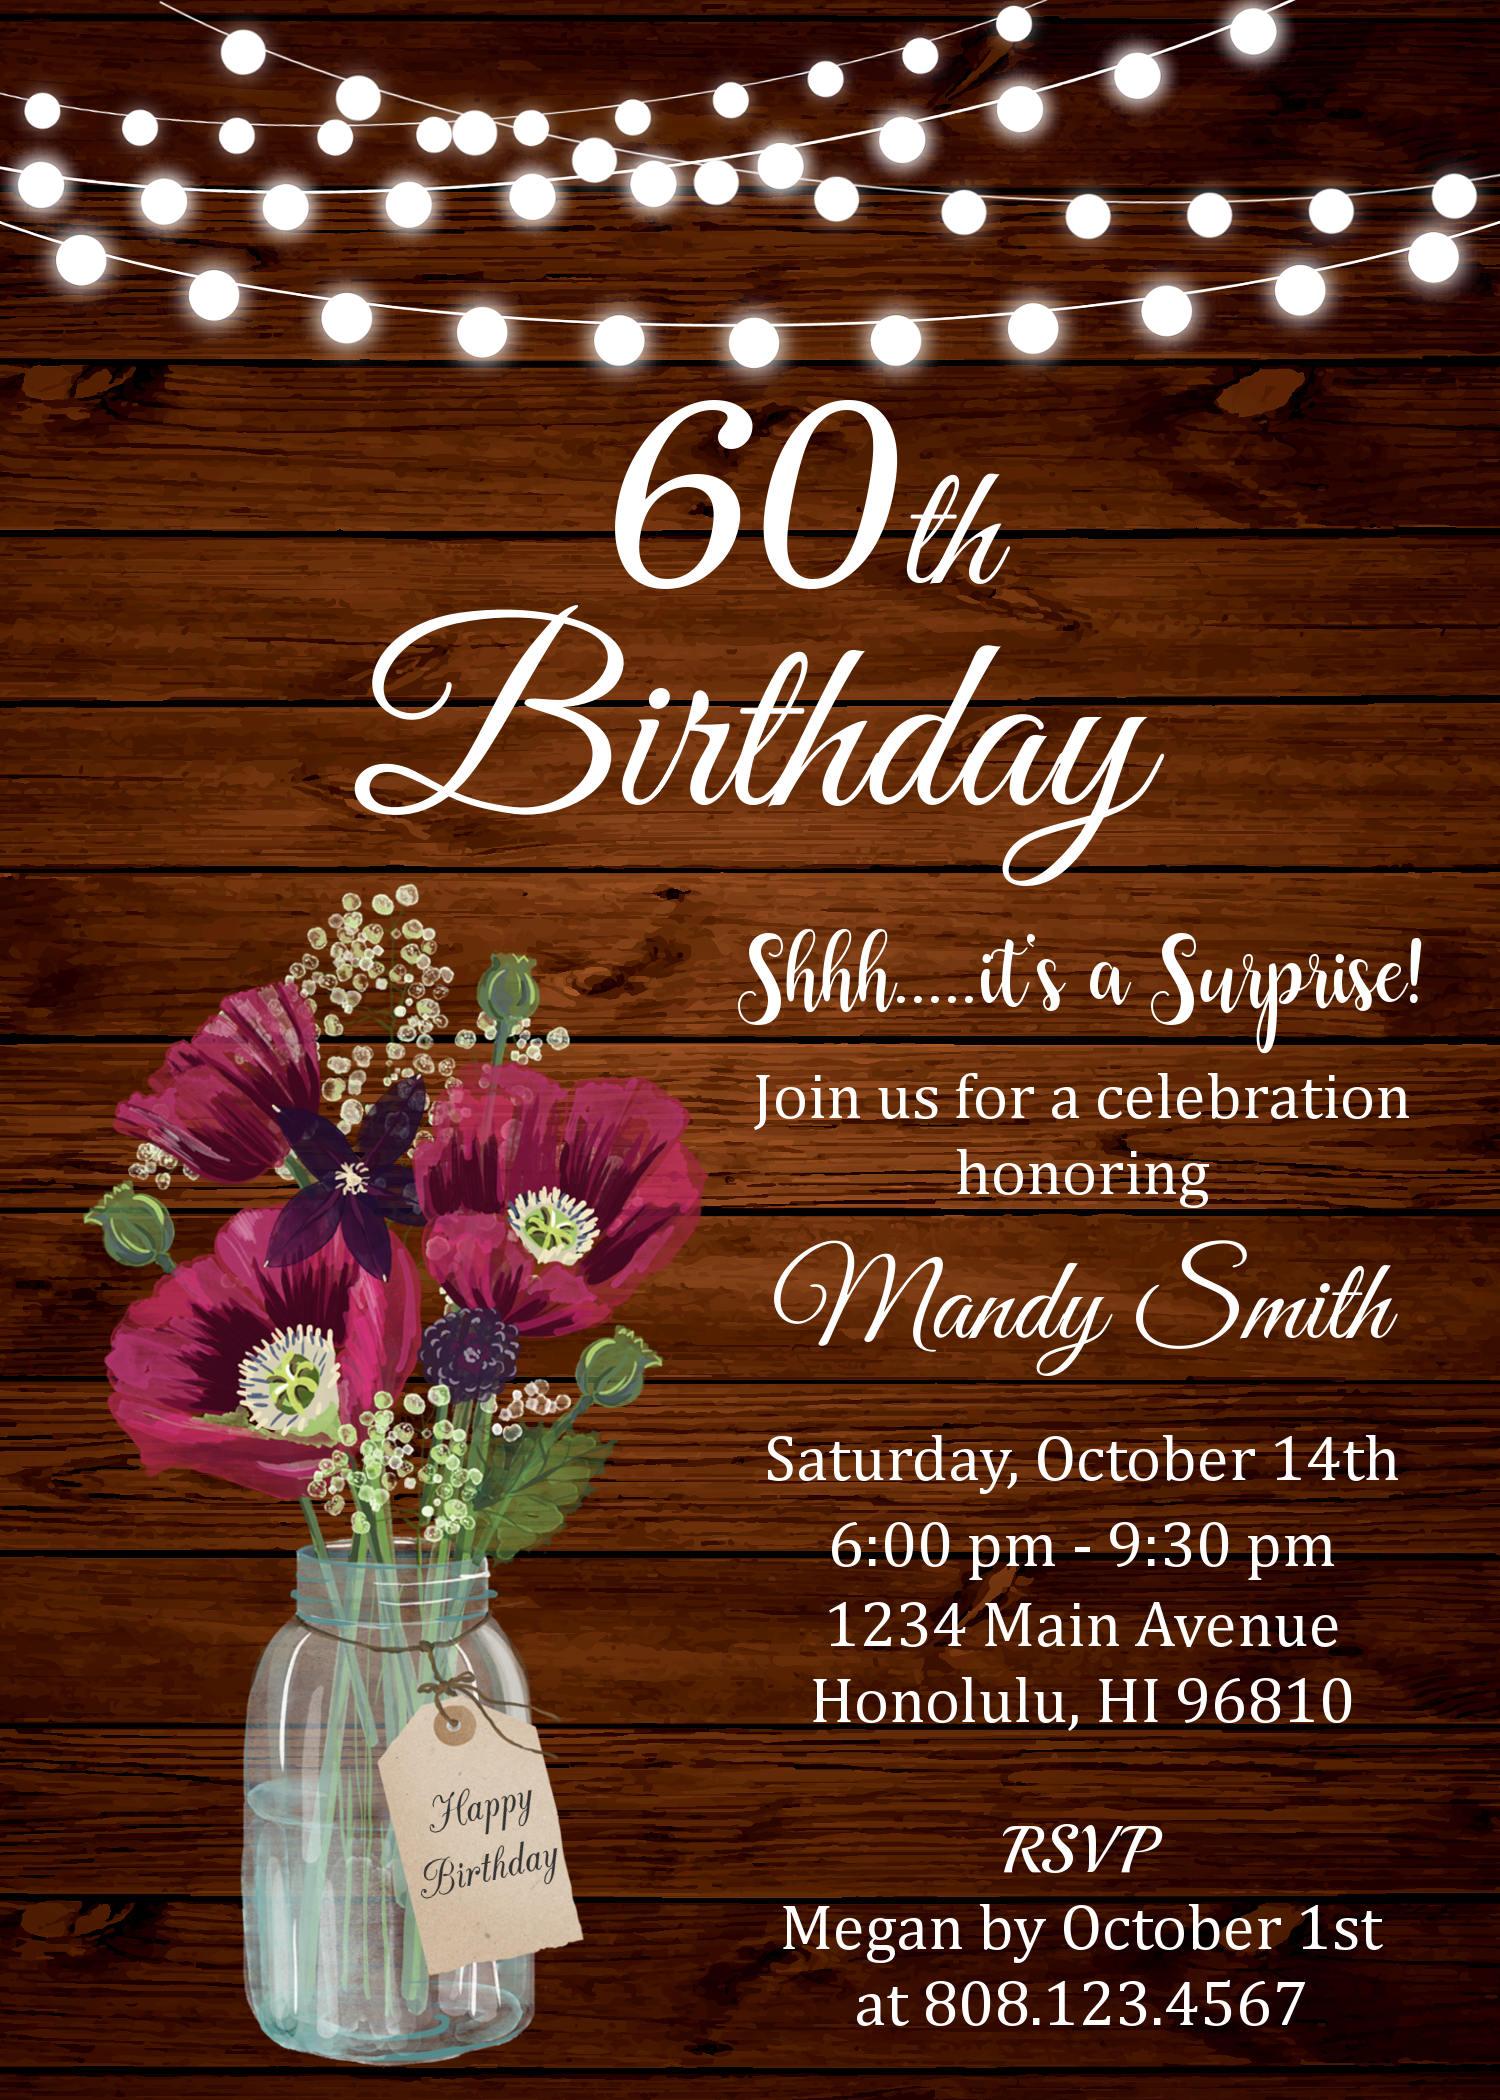 60th birthday invitations for women surprise 60th birthday 60th birthday invitations for women surprise 60th birthday invitation floral birthday invitation rustic filmwisefo